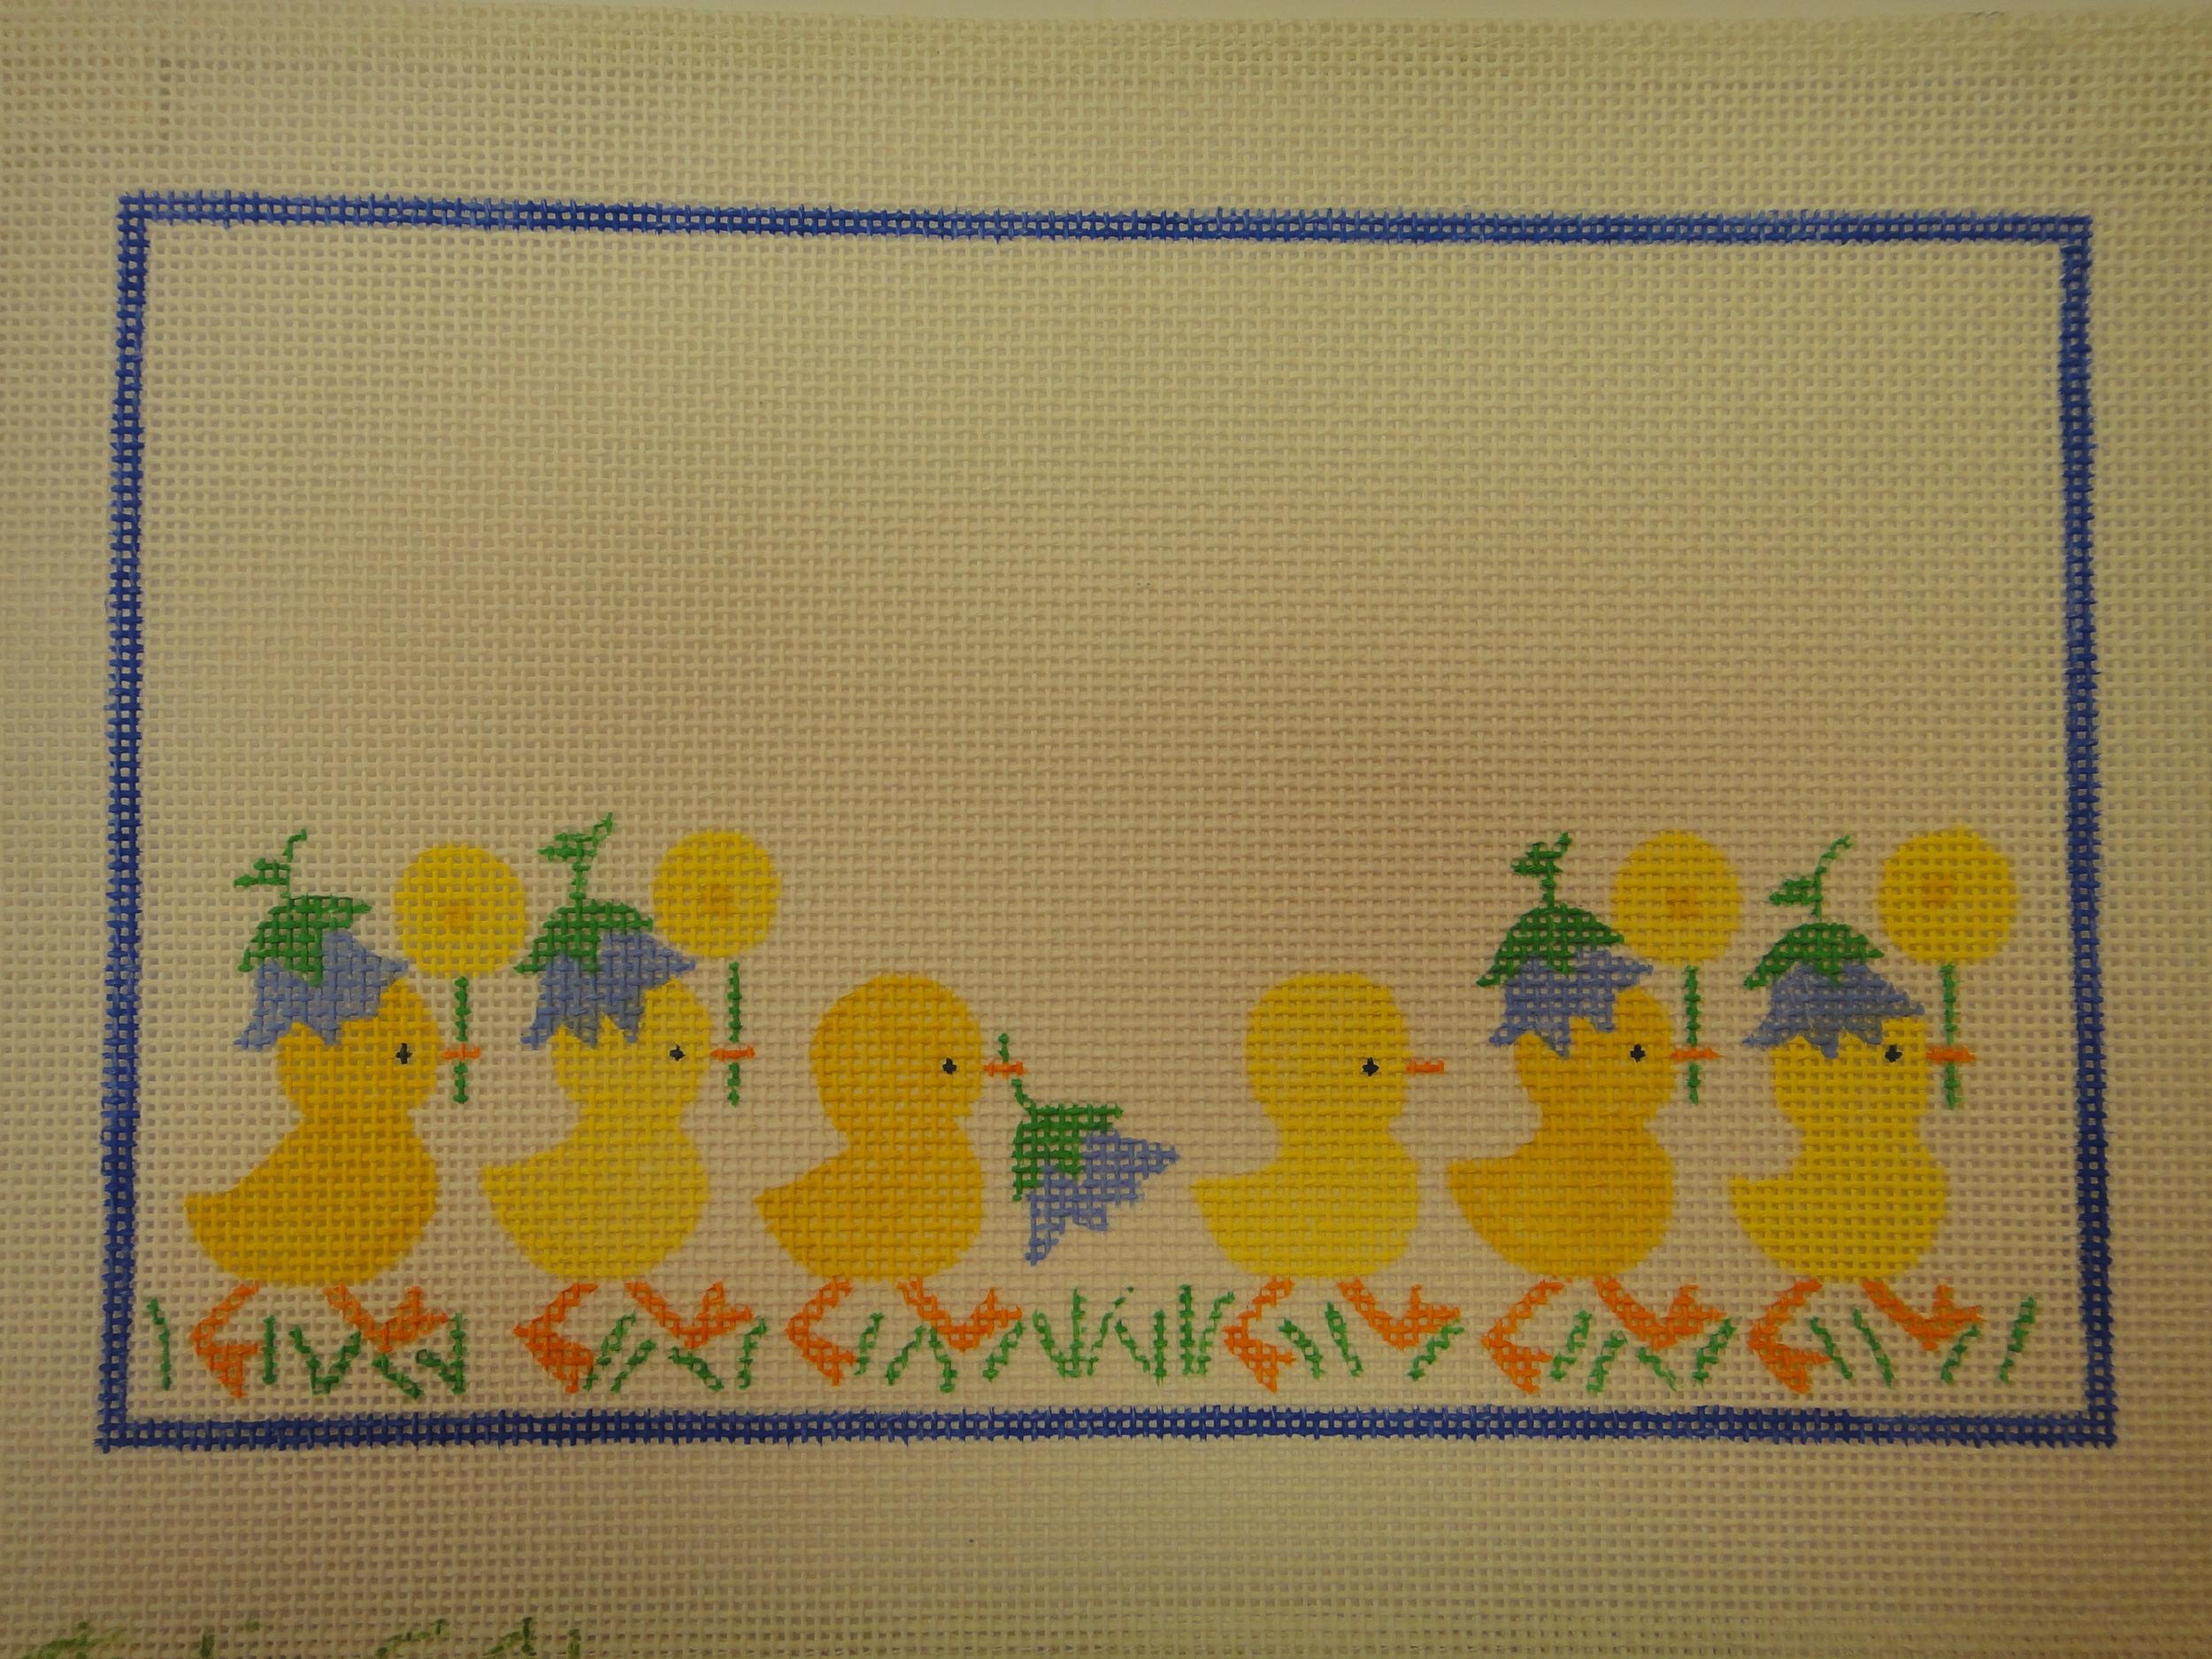 C41 Ducks Birth Announcement (11x7)